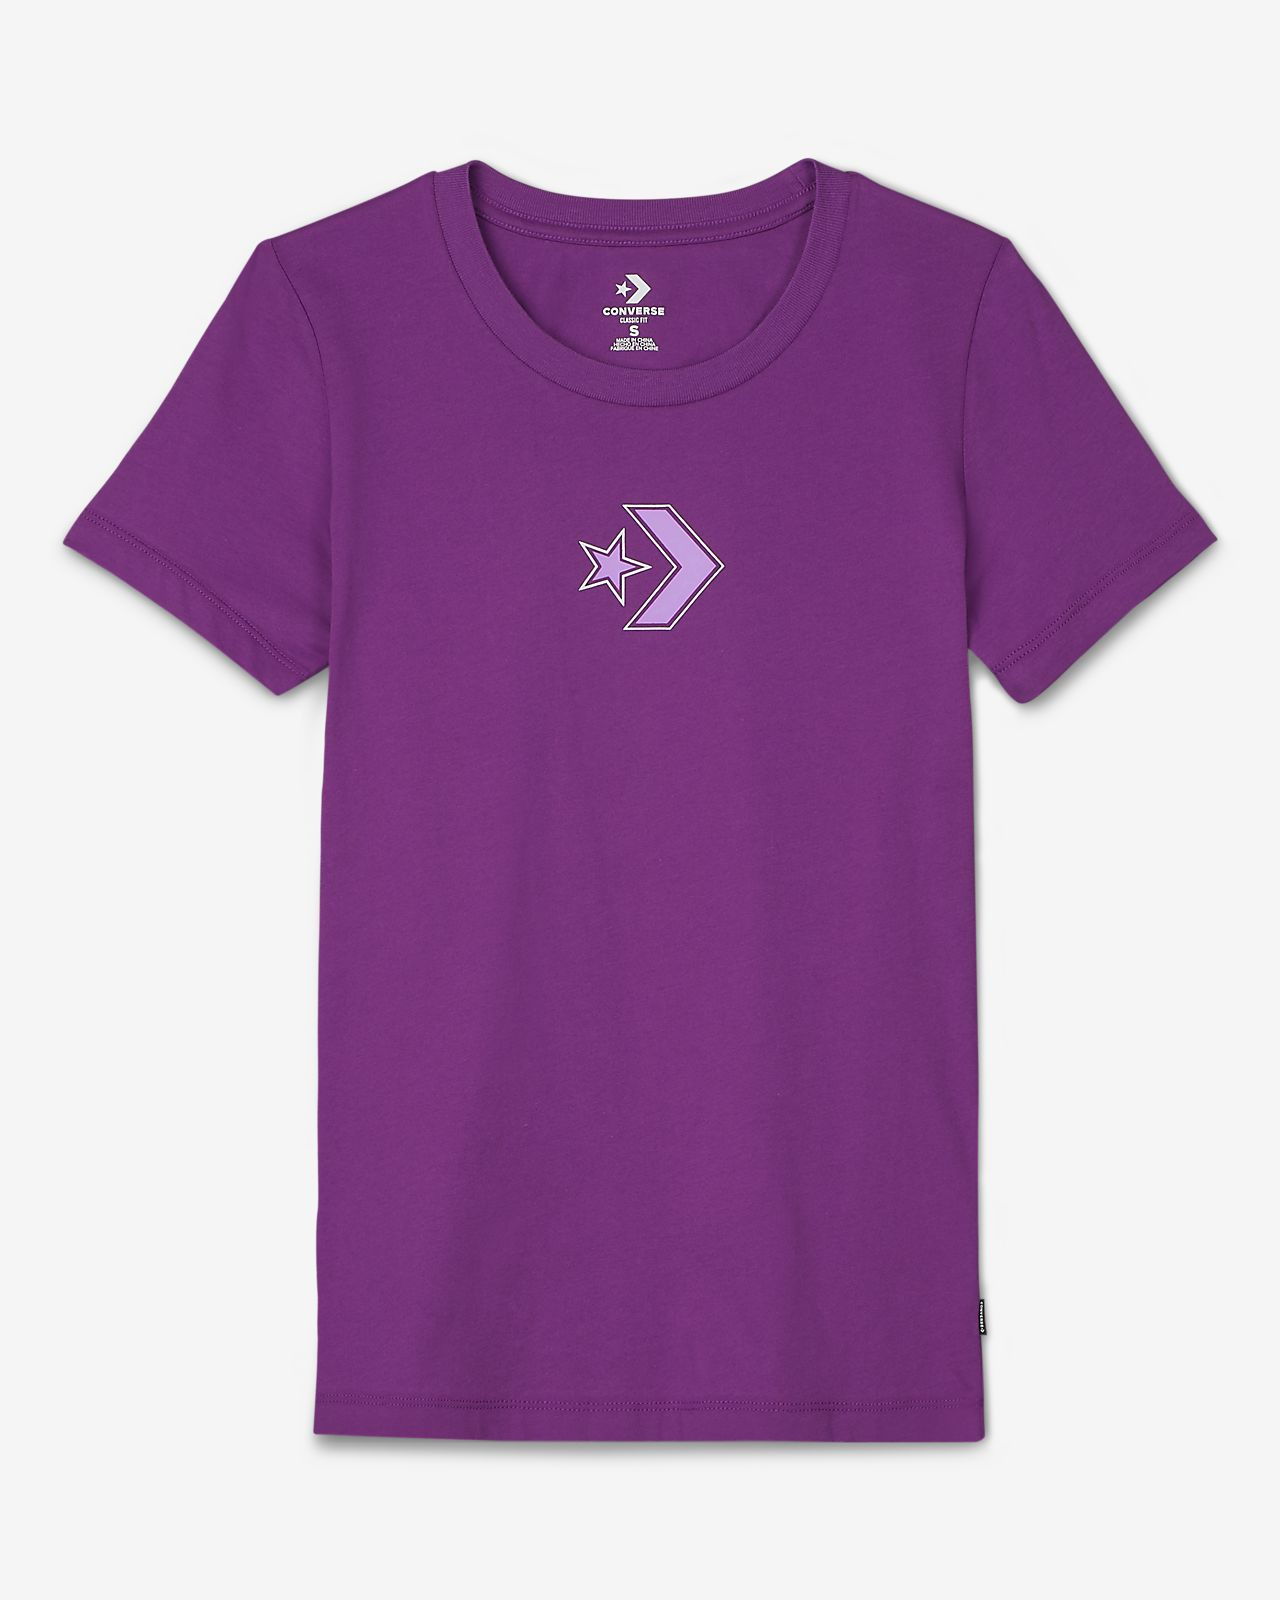 Converse Star Chevron Women's T-Shirt